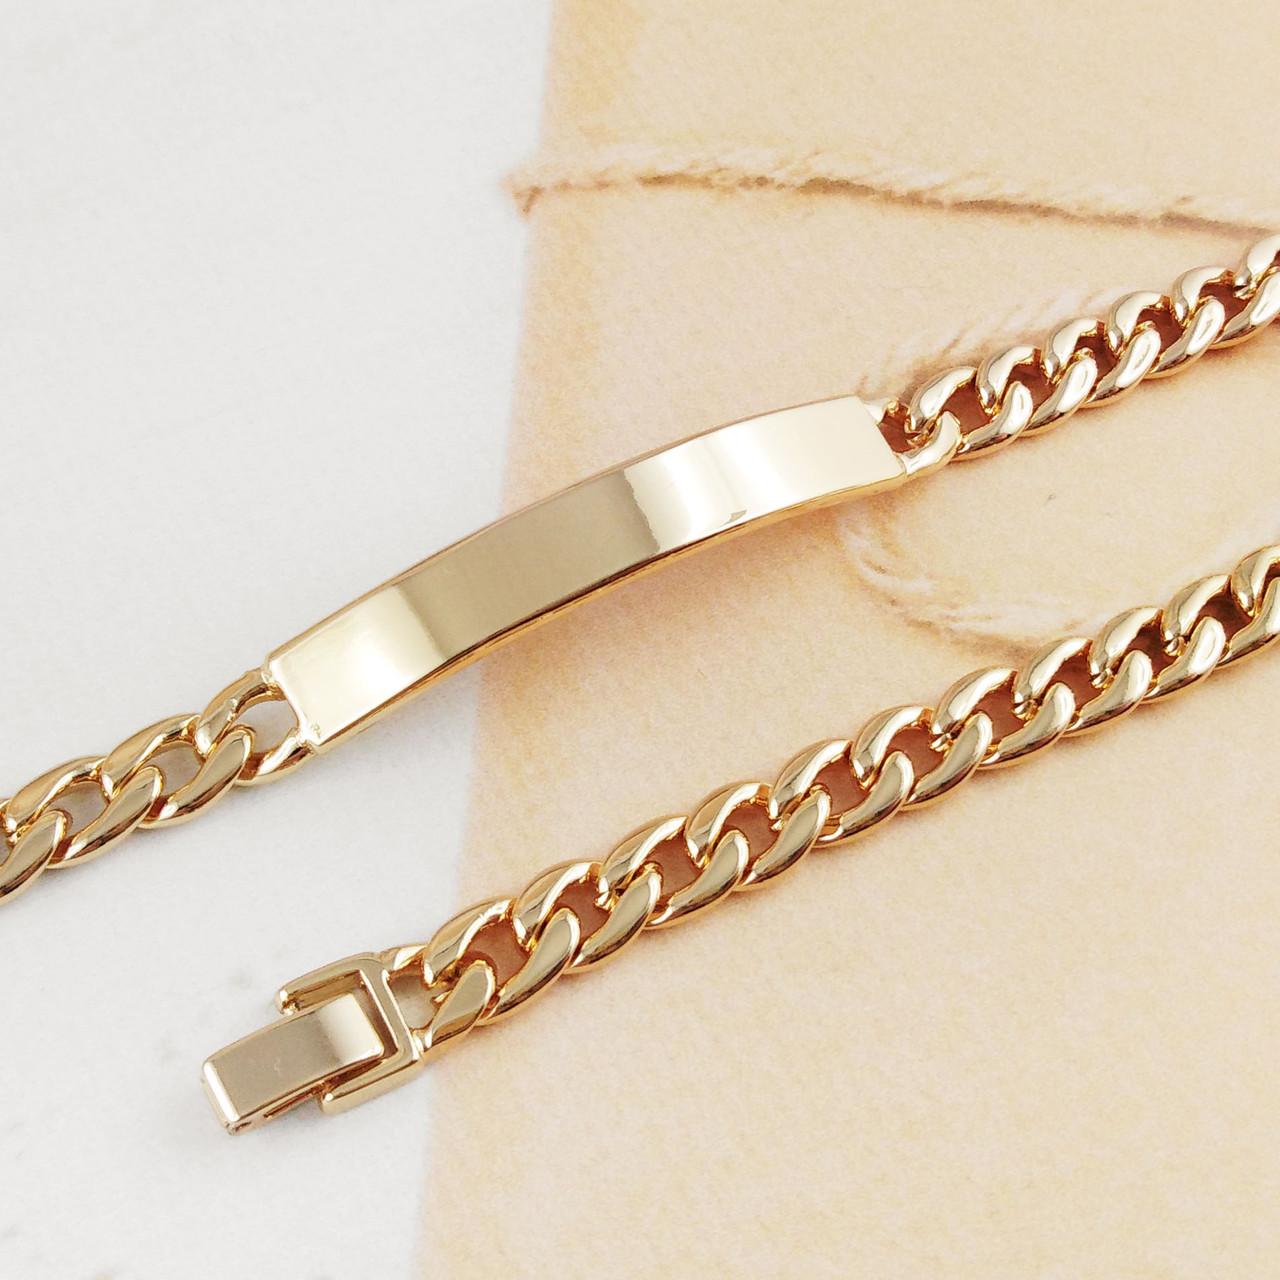 Браслет Xuping Jewelry 20 см х 7 мм Панцирное плетение с пластиной медицинское золото, позолота 18К А/В 4471